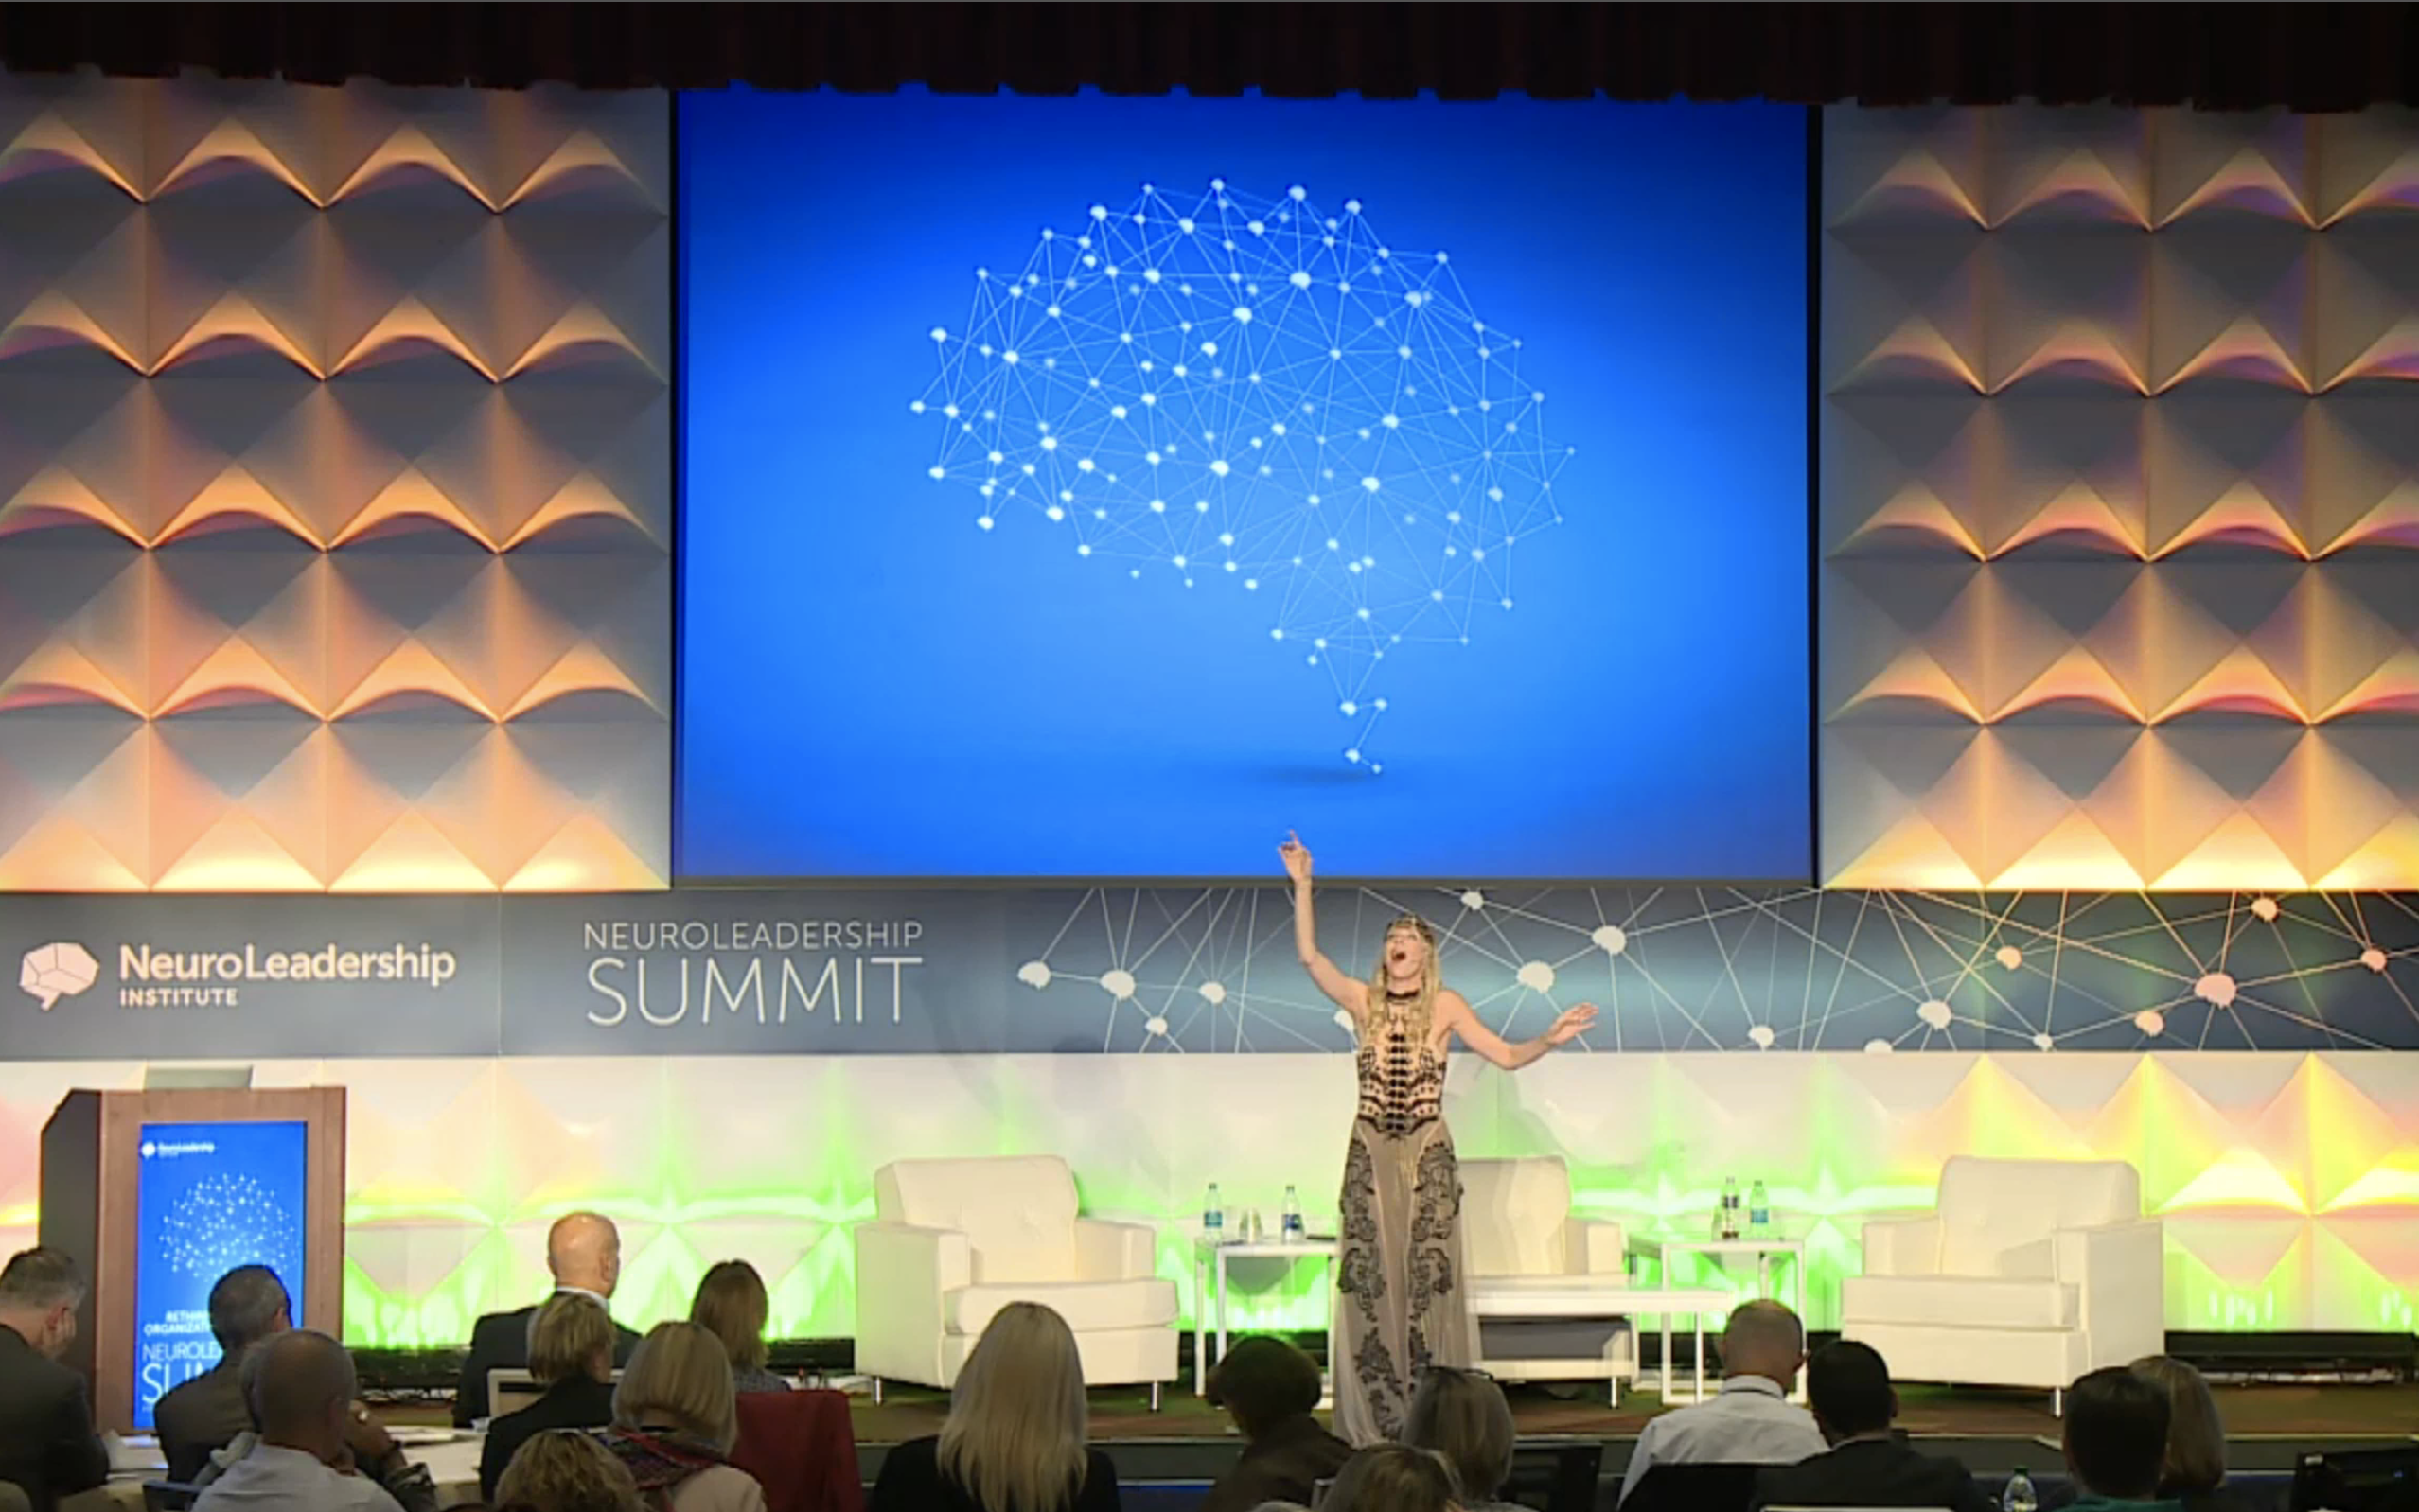 NeuroLeadership Institute Summit Performance